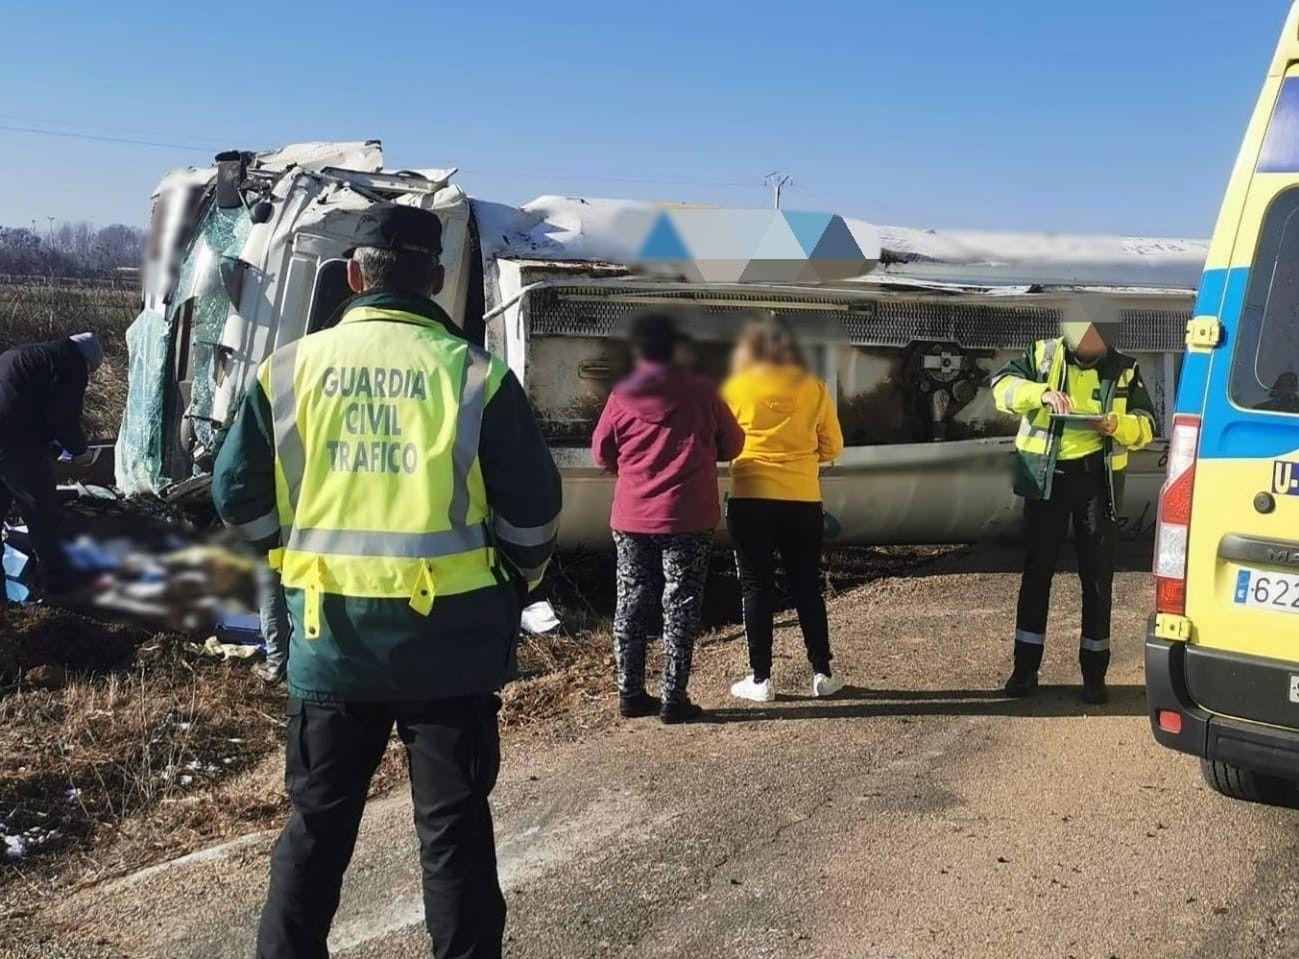 Un joven herido tras sufrir un accidente con un camión de mercancías peligrosas en Zamora